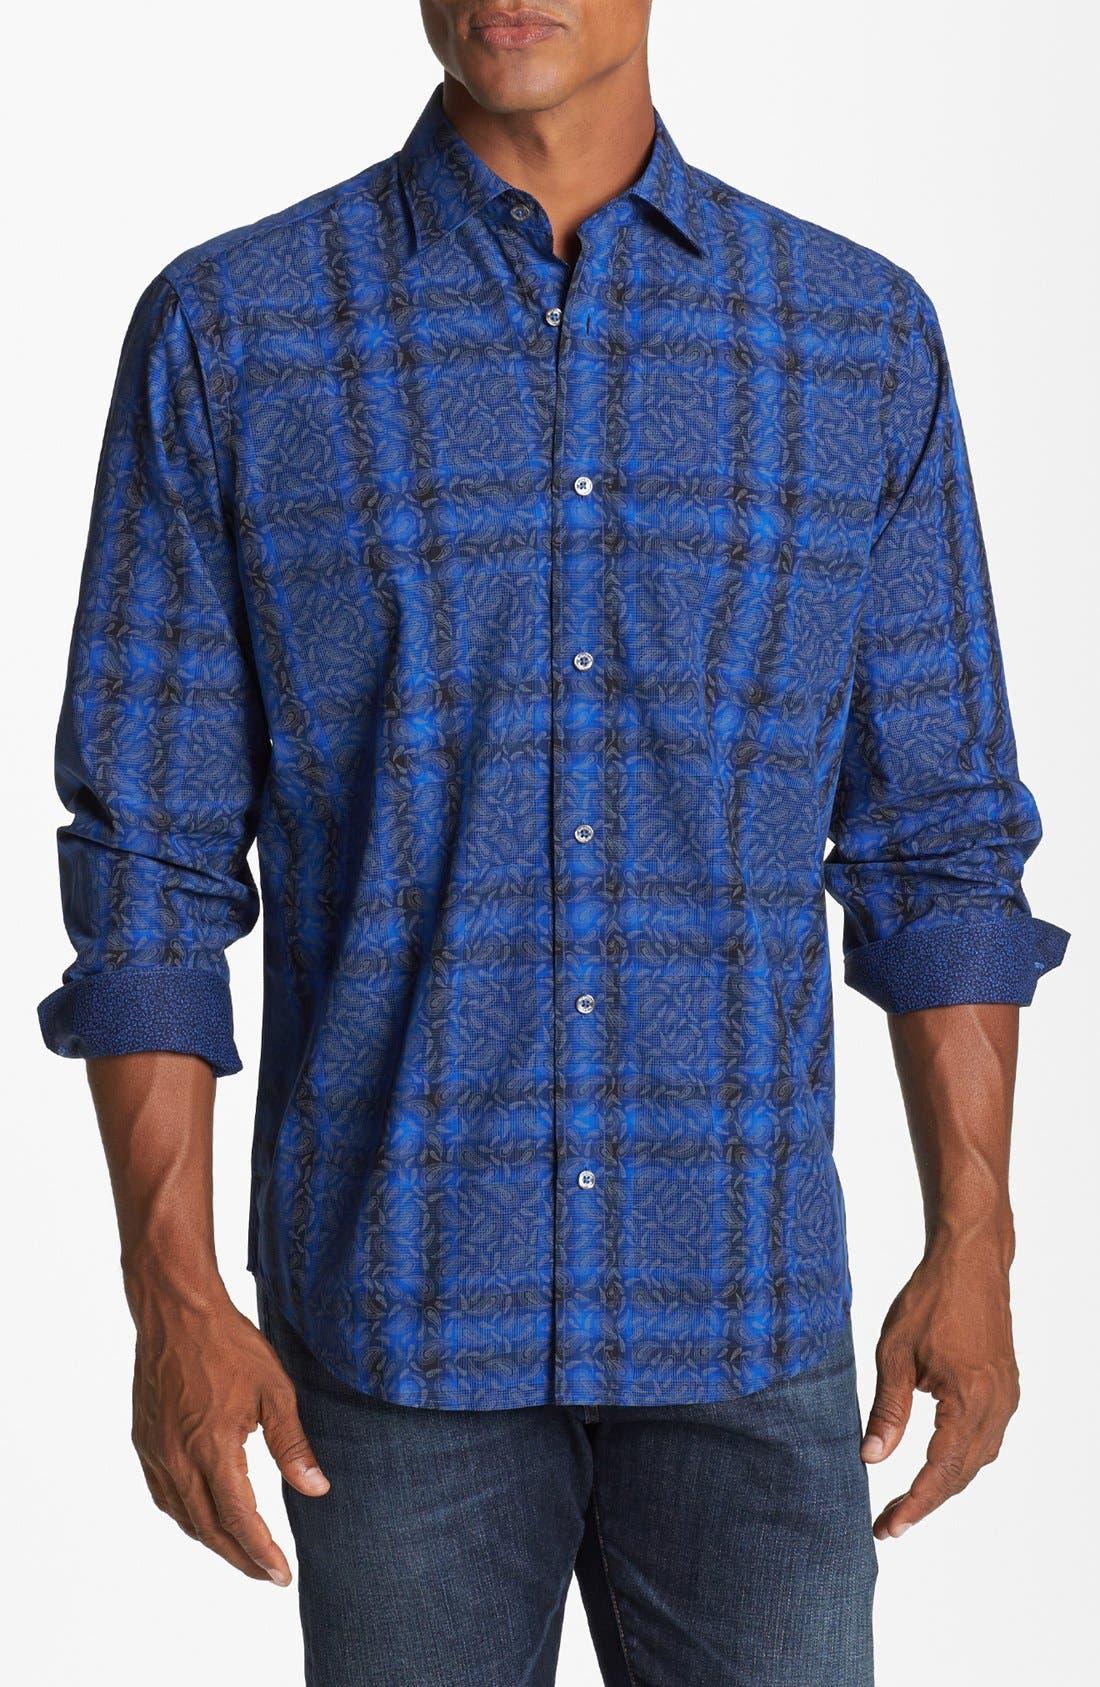 Main Image - Bugatchi Paisley Check Classic Fit Cotton Sport Shirt (Tall)